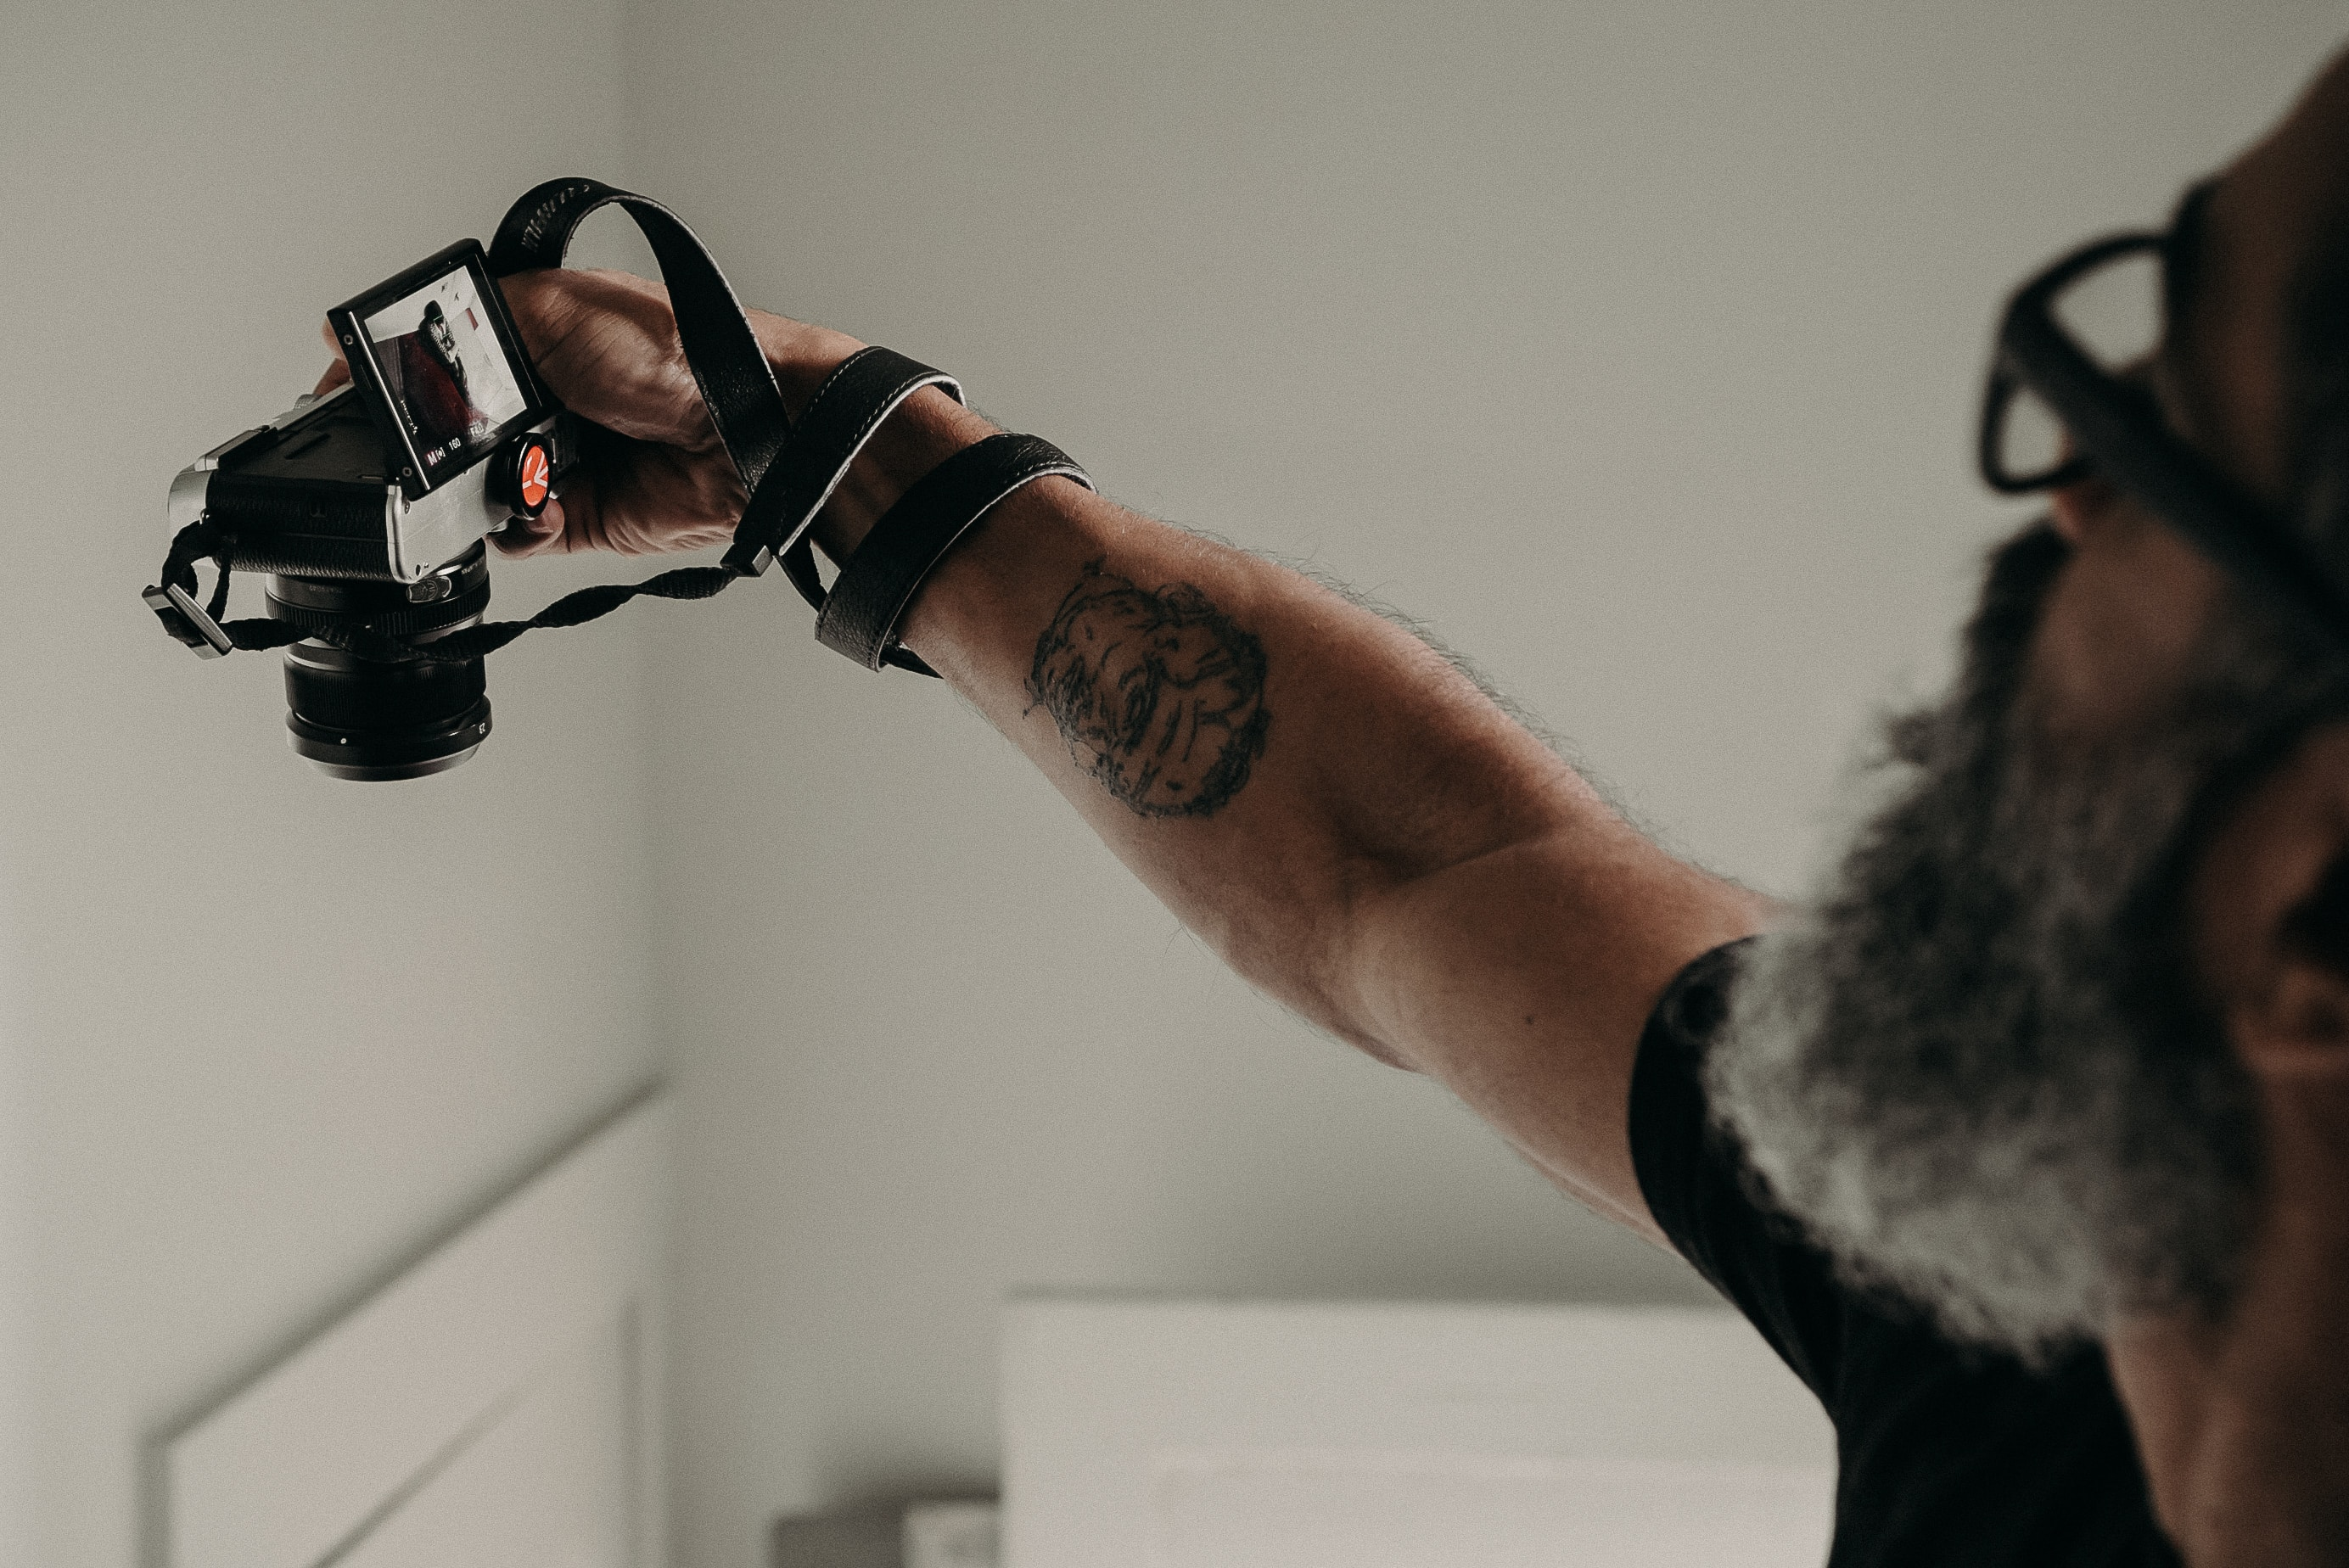 Best Camera Wrist Straps image